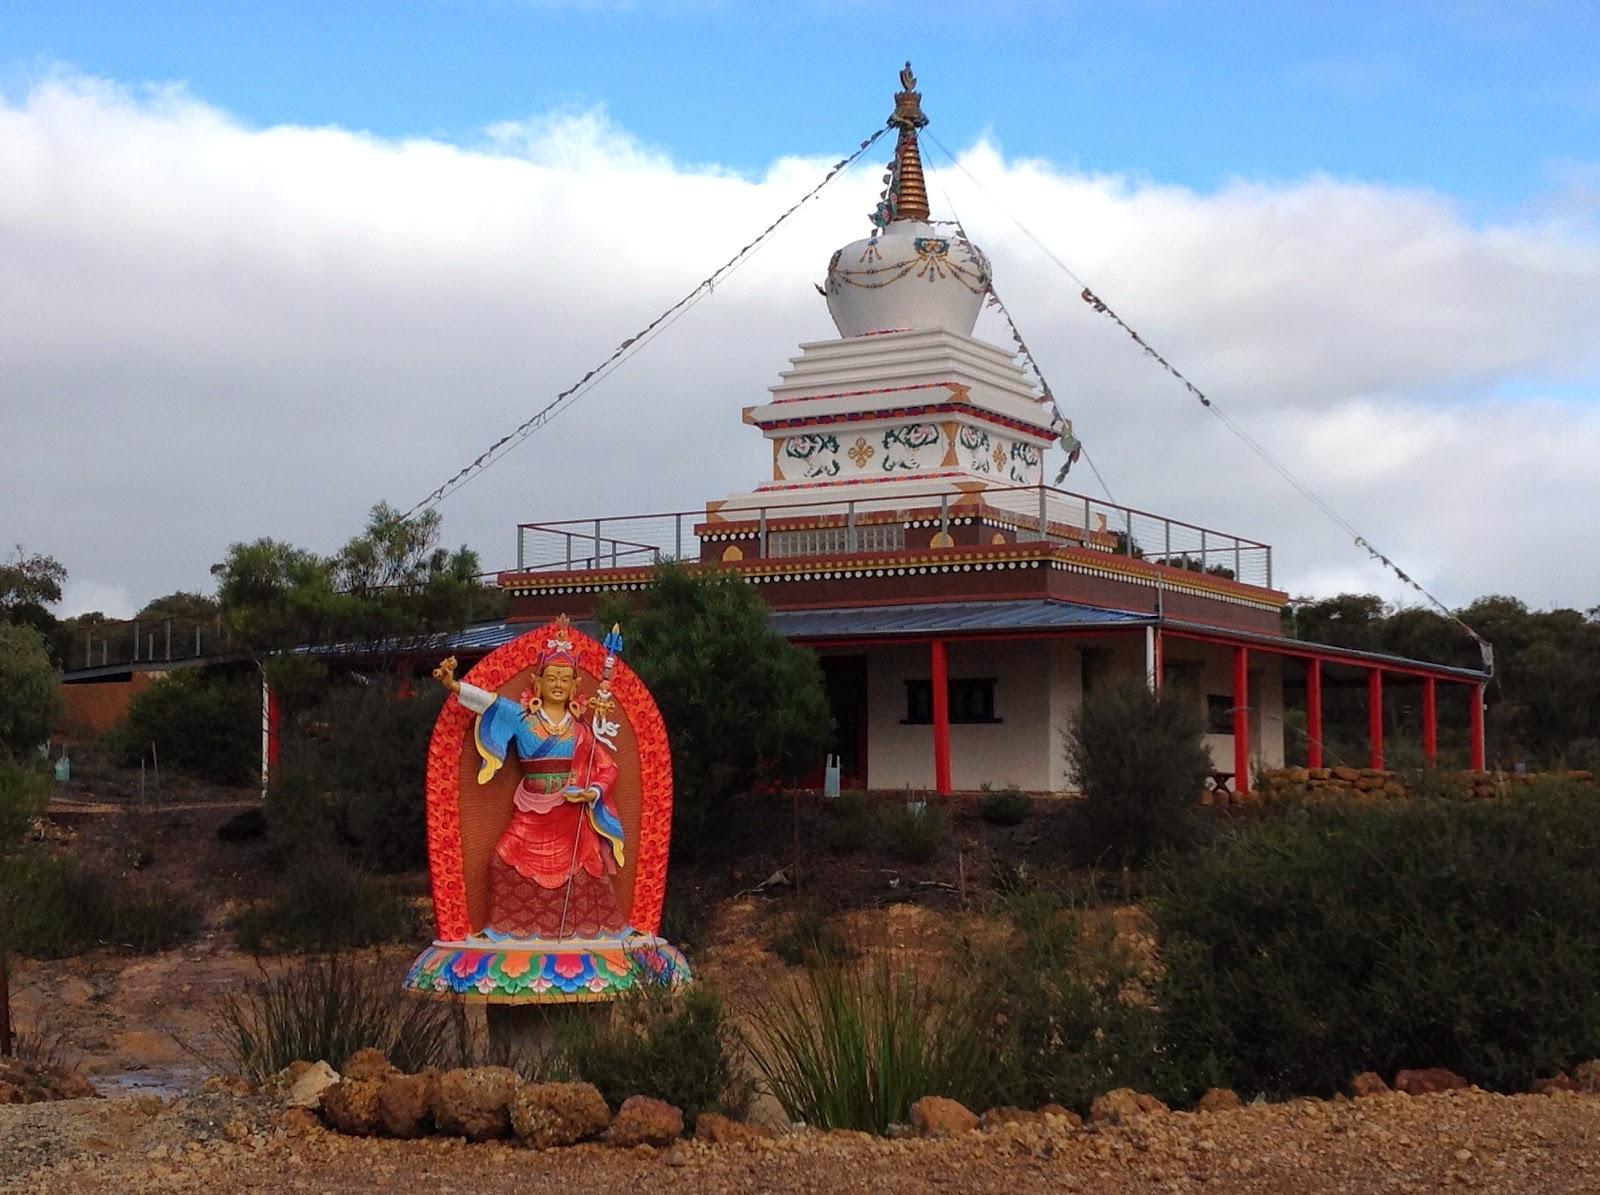 9 ft Padmasambhava statue at De-Tong Ling Retreat Centre, Kangaroo Island, AUS.